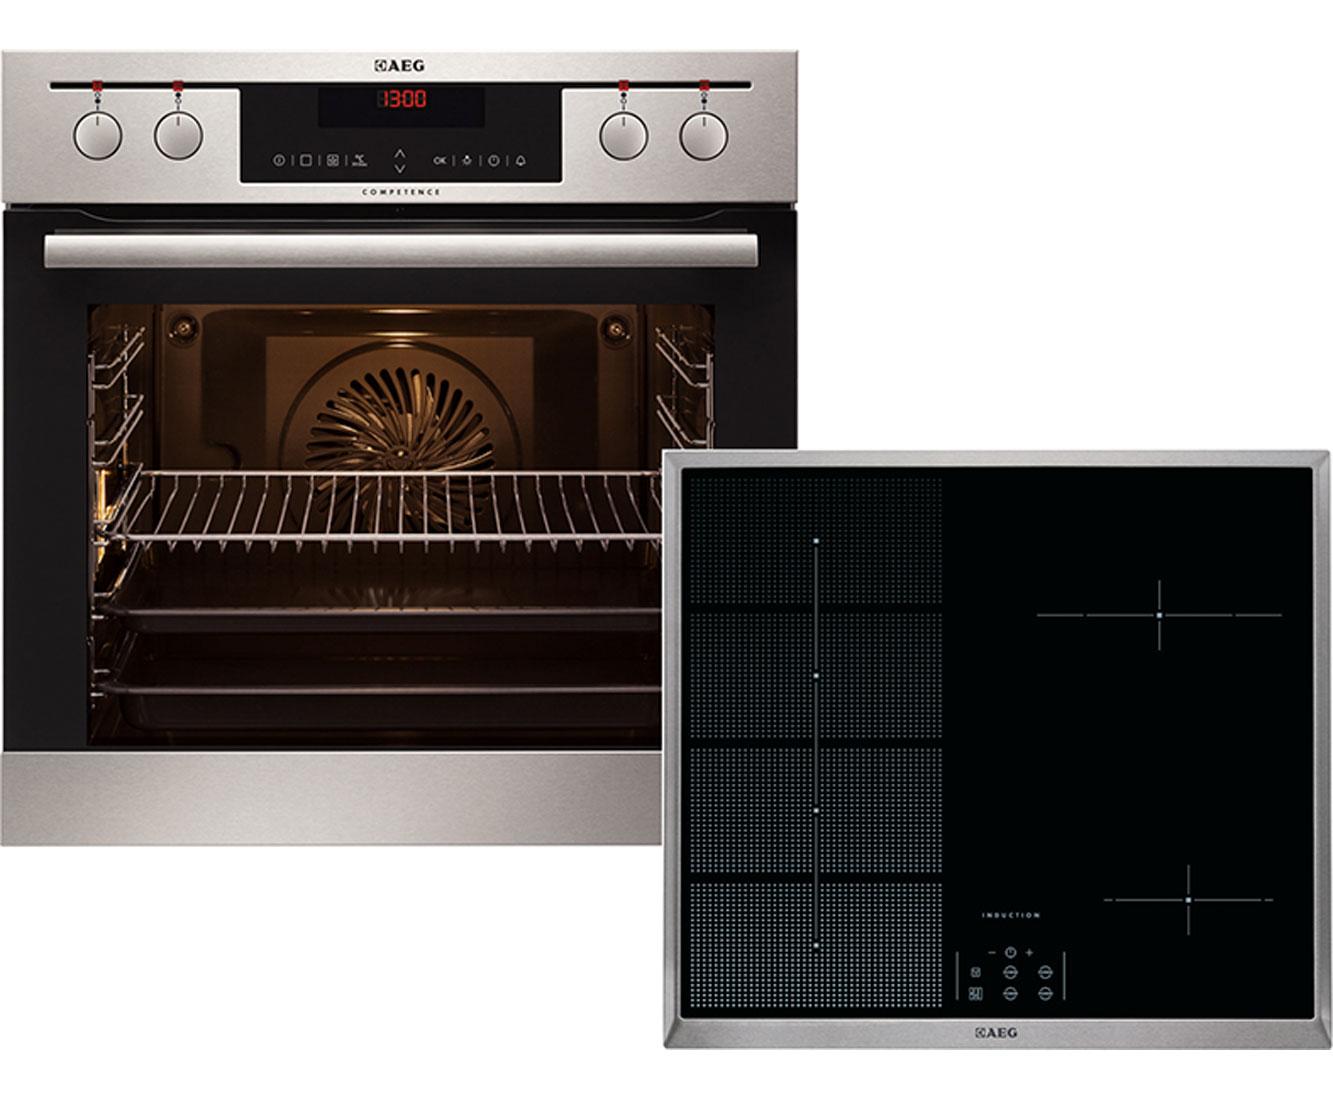 aeg competence einbauherd set eingebaut eemx371321. Black Bedroom Furniture Sets. Home Design Ideas